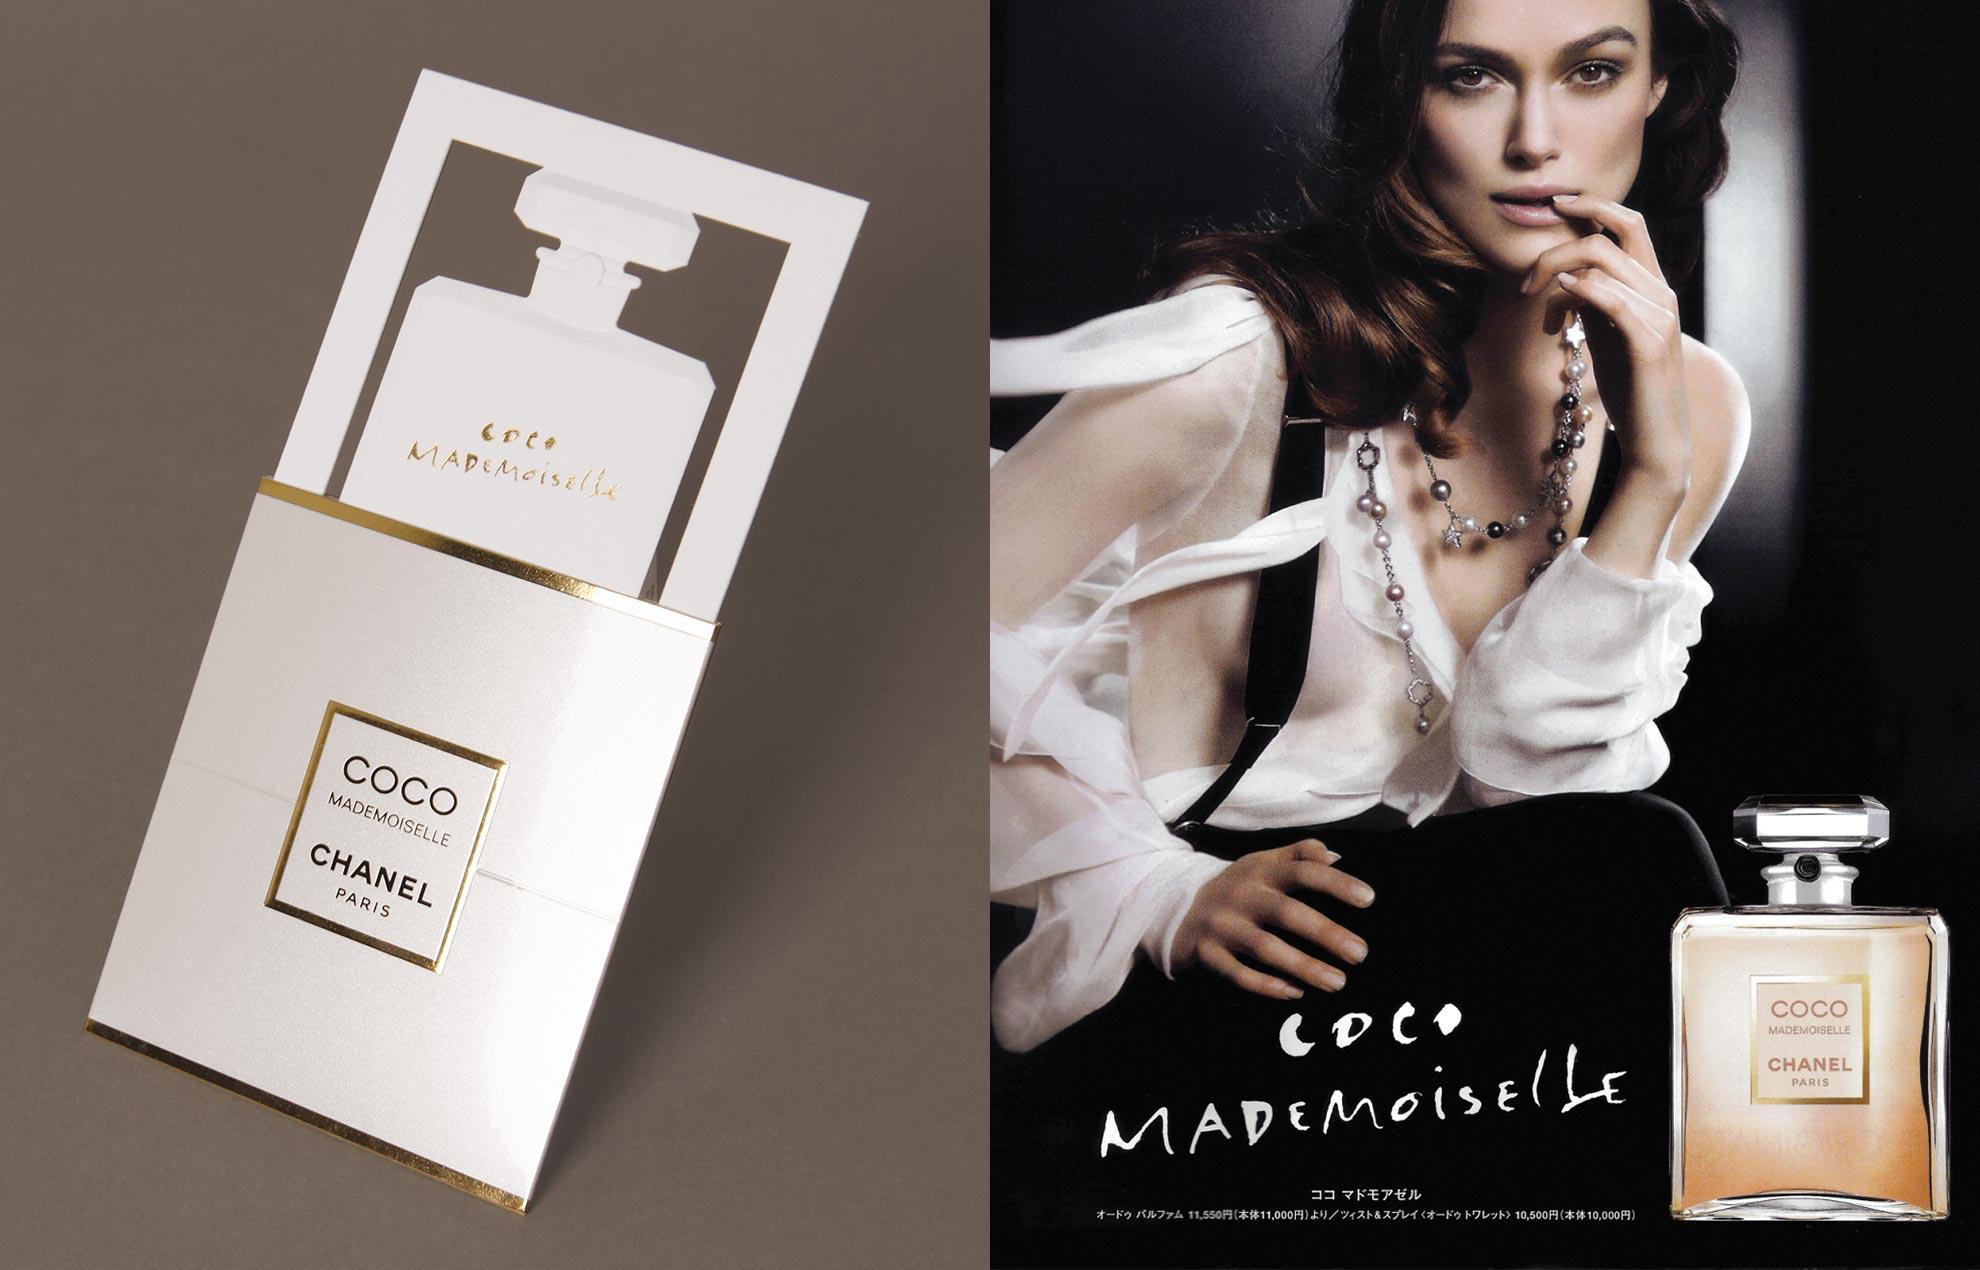 coco mademoiselle gaufrage cr ation graphique touche parfum. Black Bedroom Furniture Sets. Home Design Ideas